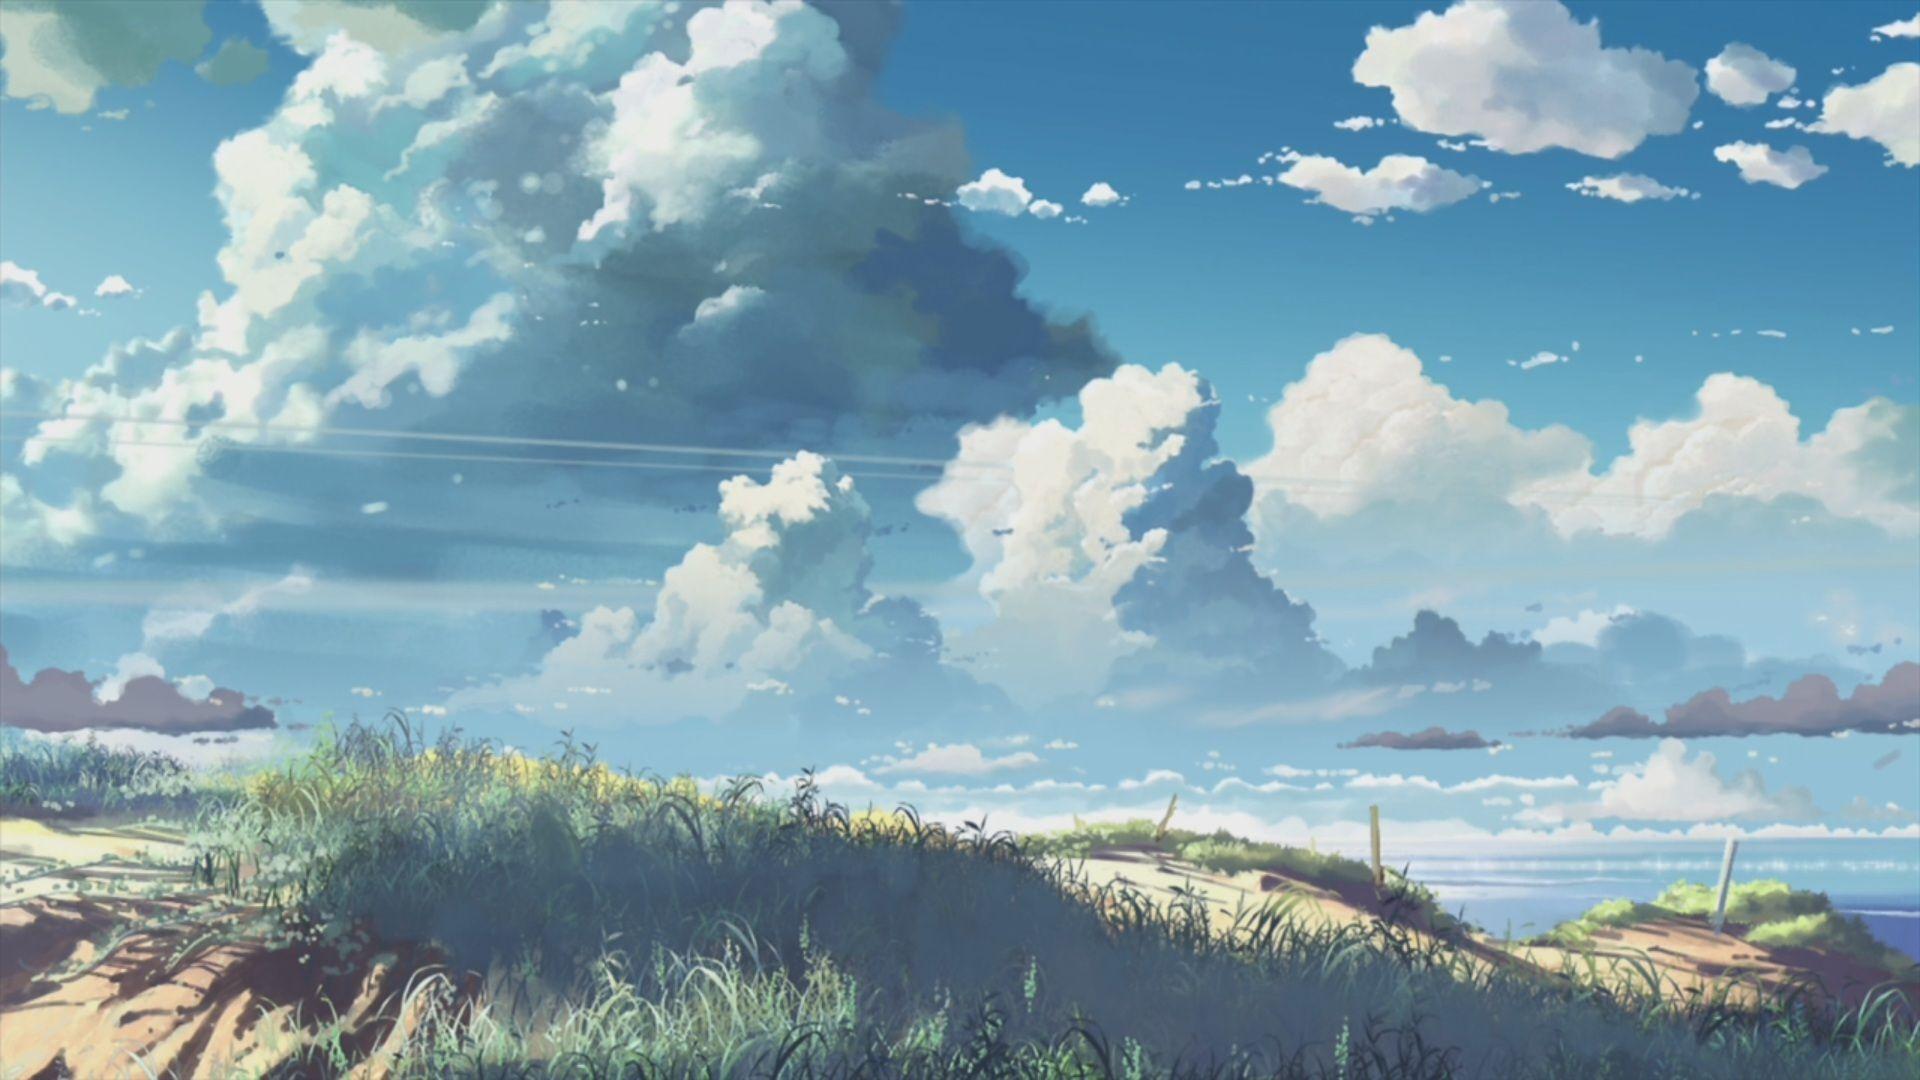 Anime Scenery 3 Anime Scenery Scenery Background Anime Scenery Wallpaper